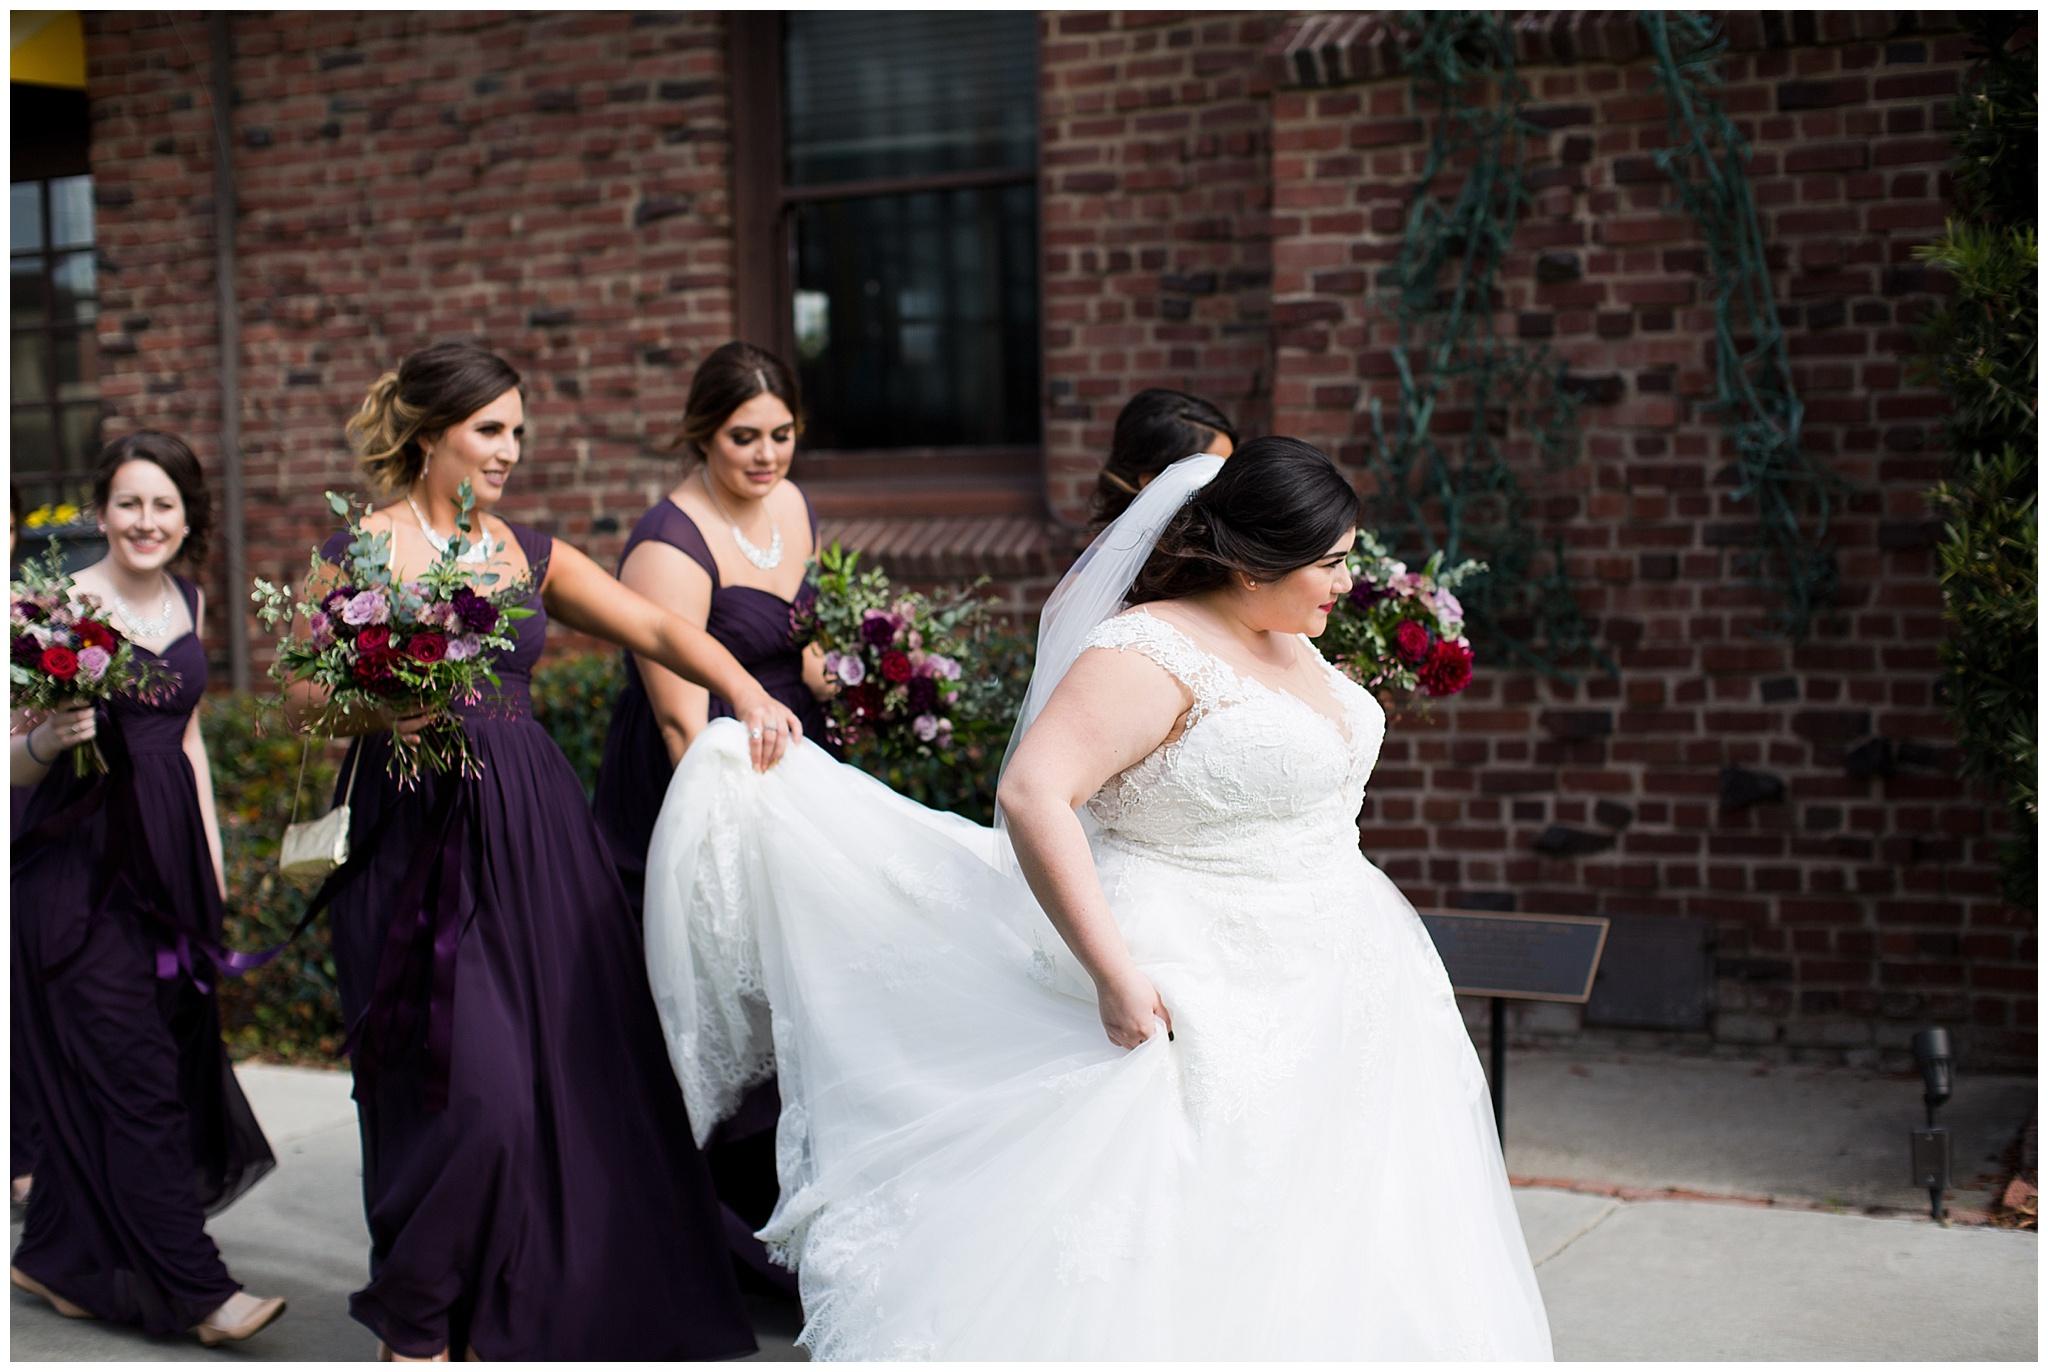 Carol_and_Grant_Wedding_3-3-18-7472.jpg